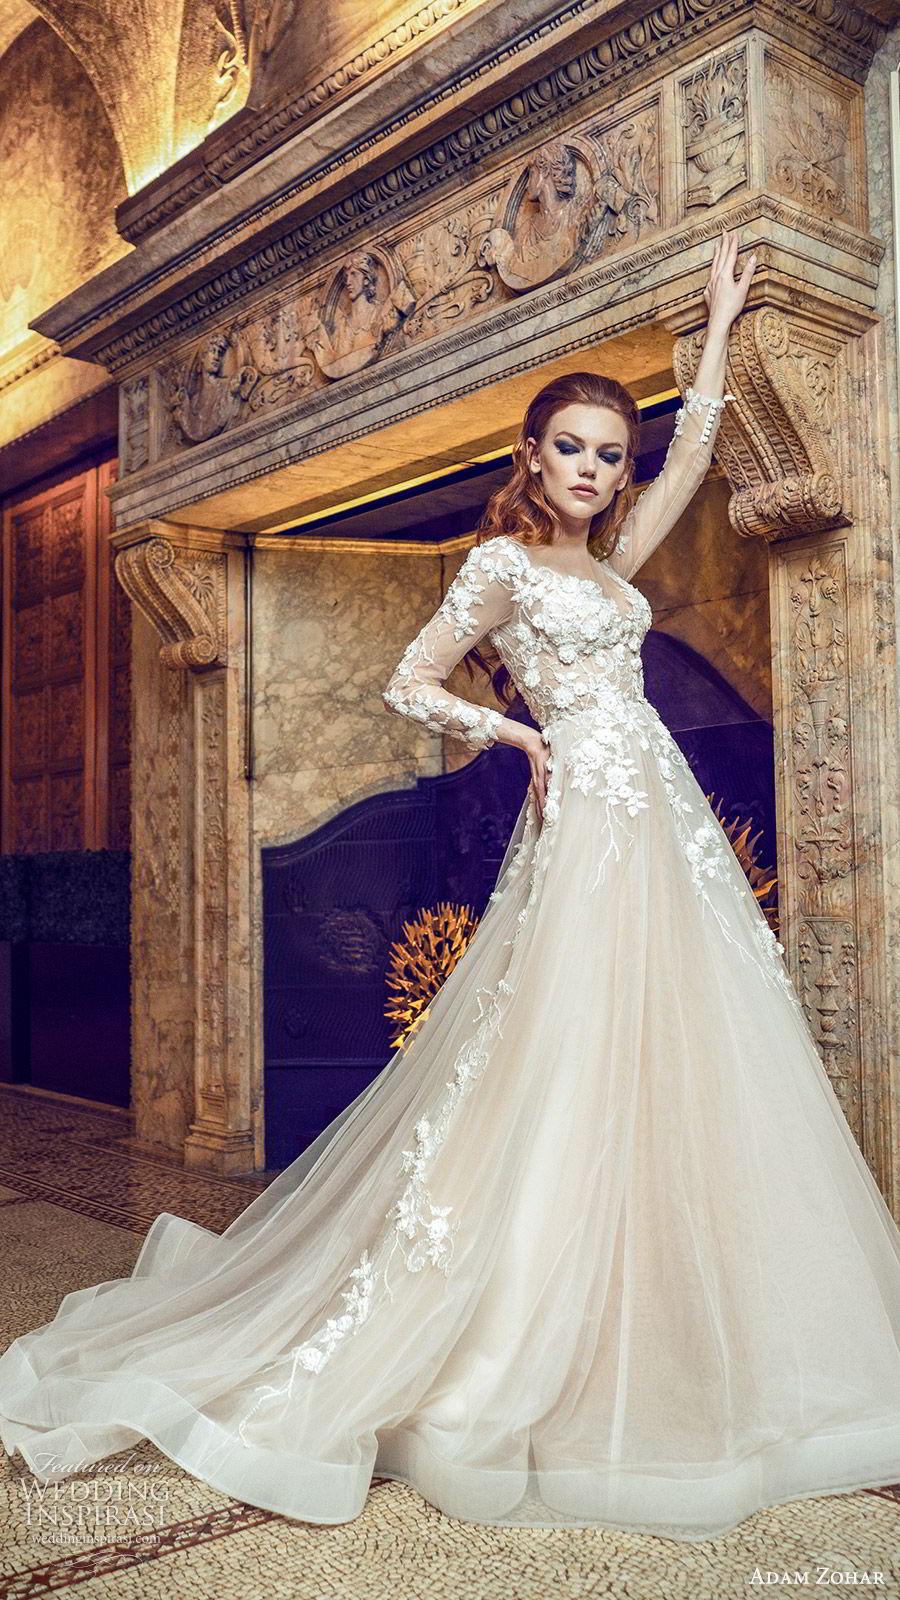 adam zohar 2020 bridal illusion long slseeves sweetheart neckline embellished bodice a line ball gown wedding dress (1) blush romantic elegant chapel train mv